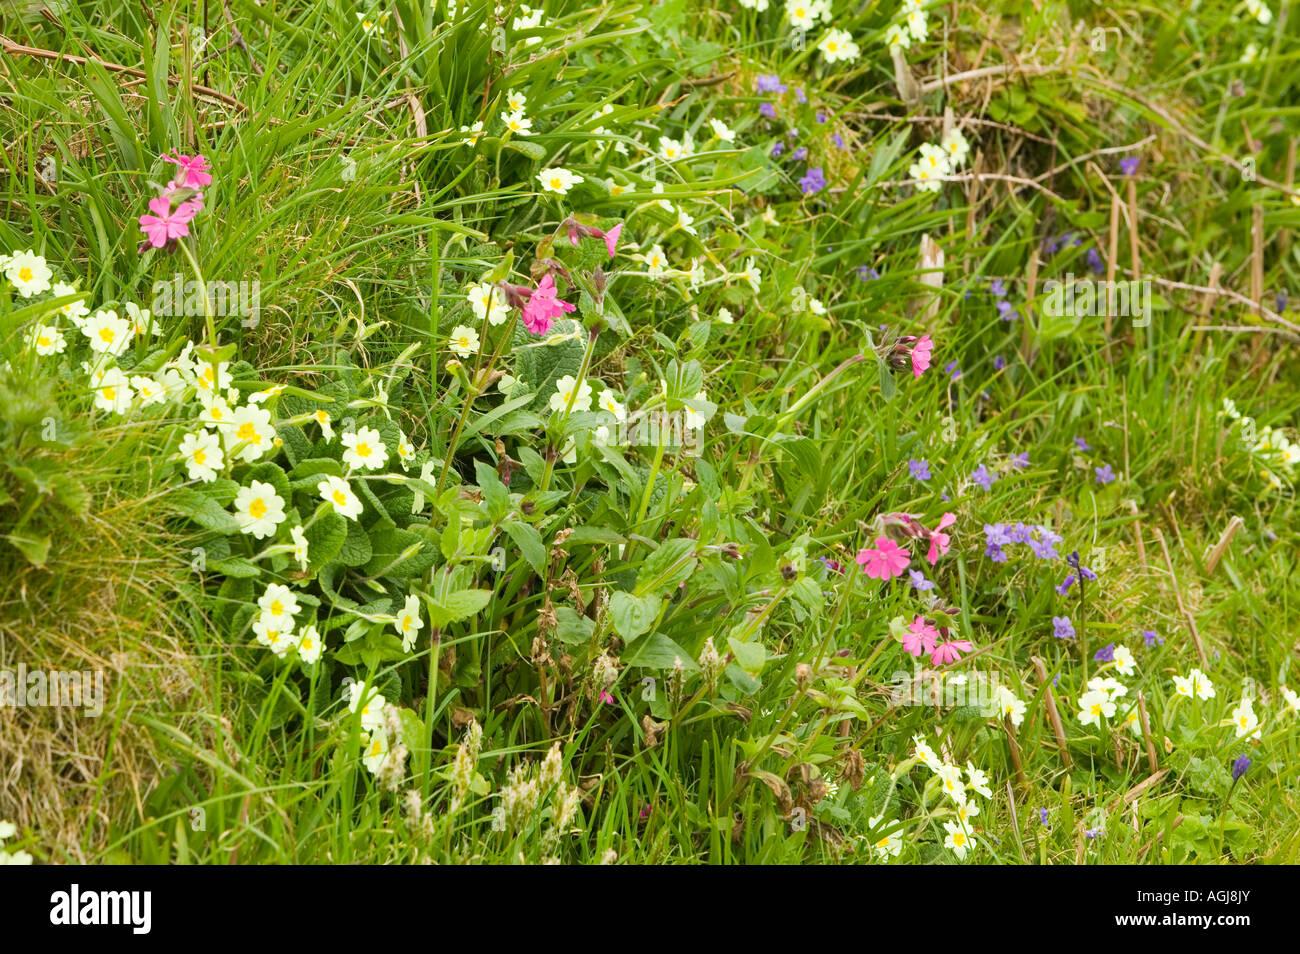 spring wildflowers on the Cornish coast, Cornwall, UK Stock Photo